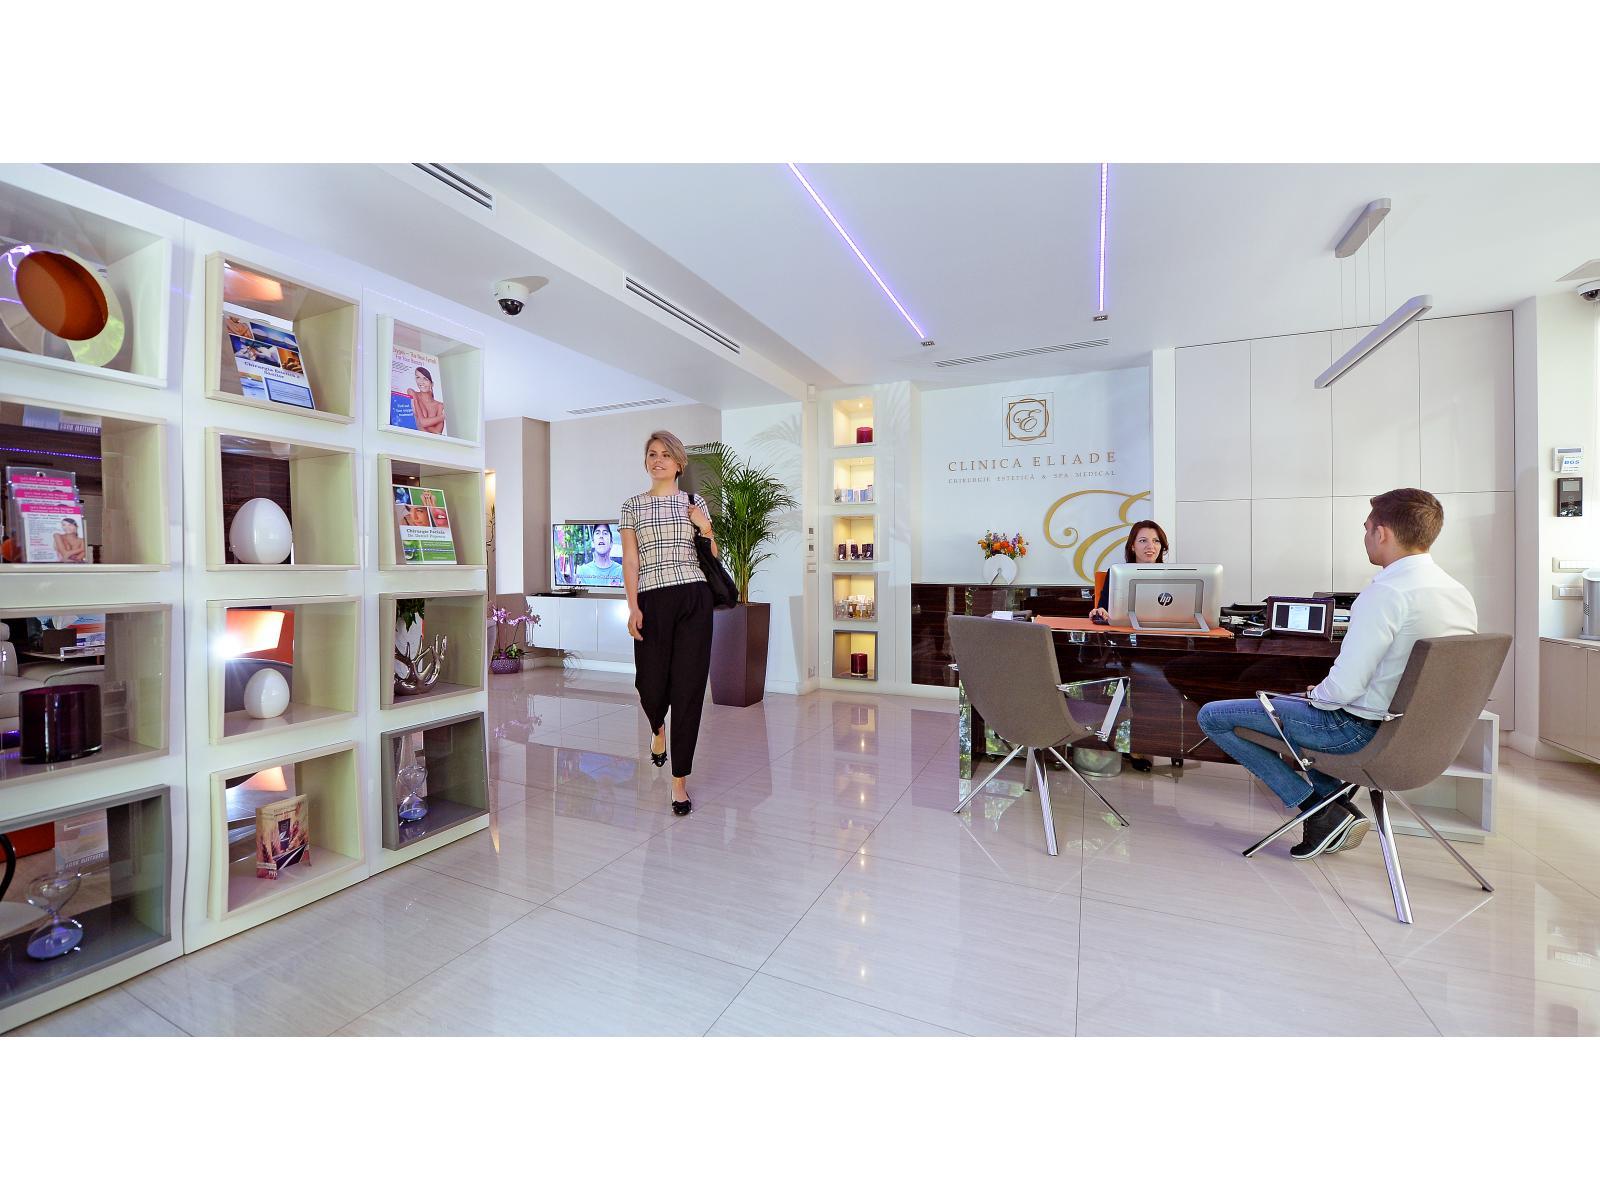 Clinica Eliade - receptie_Mika_plecand.jpg